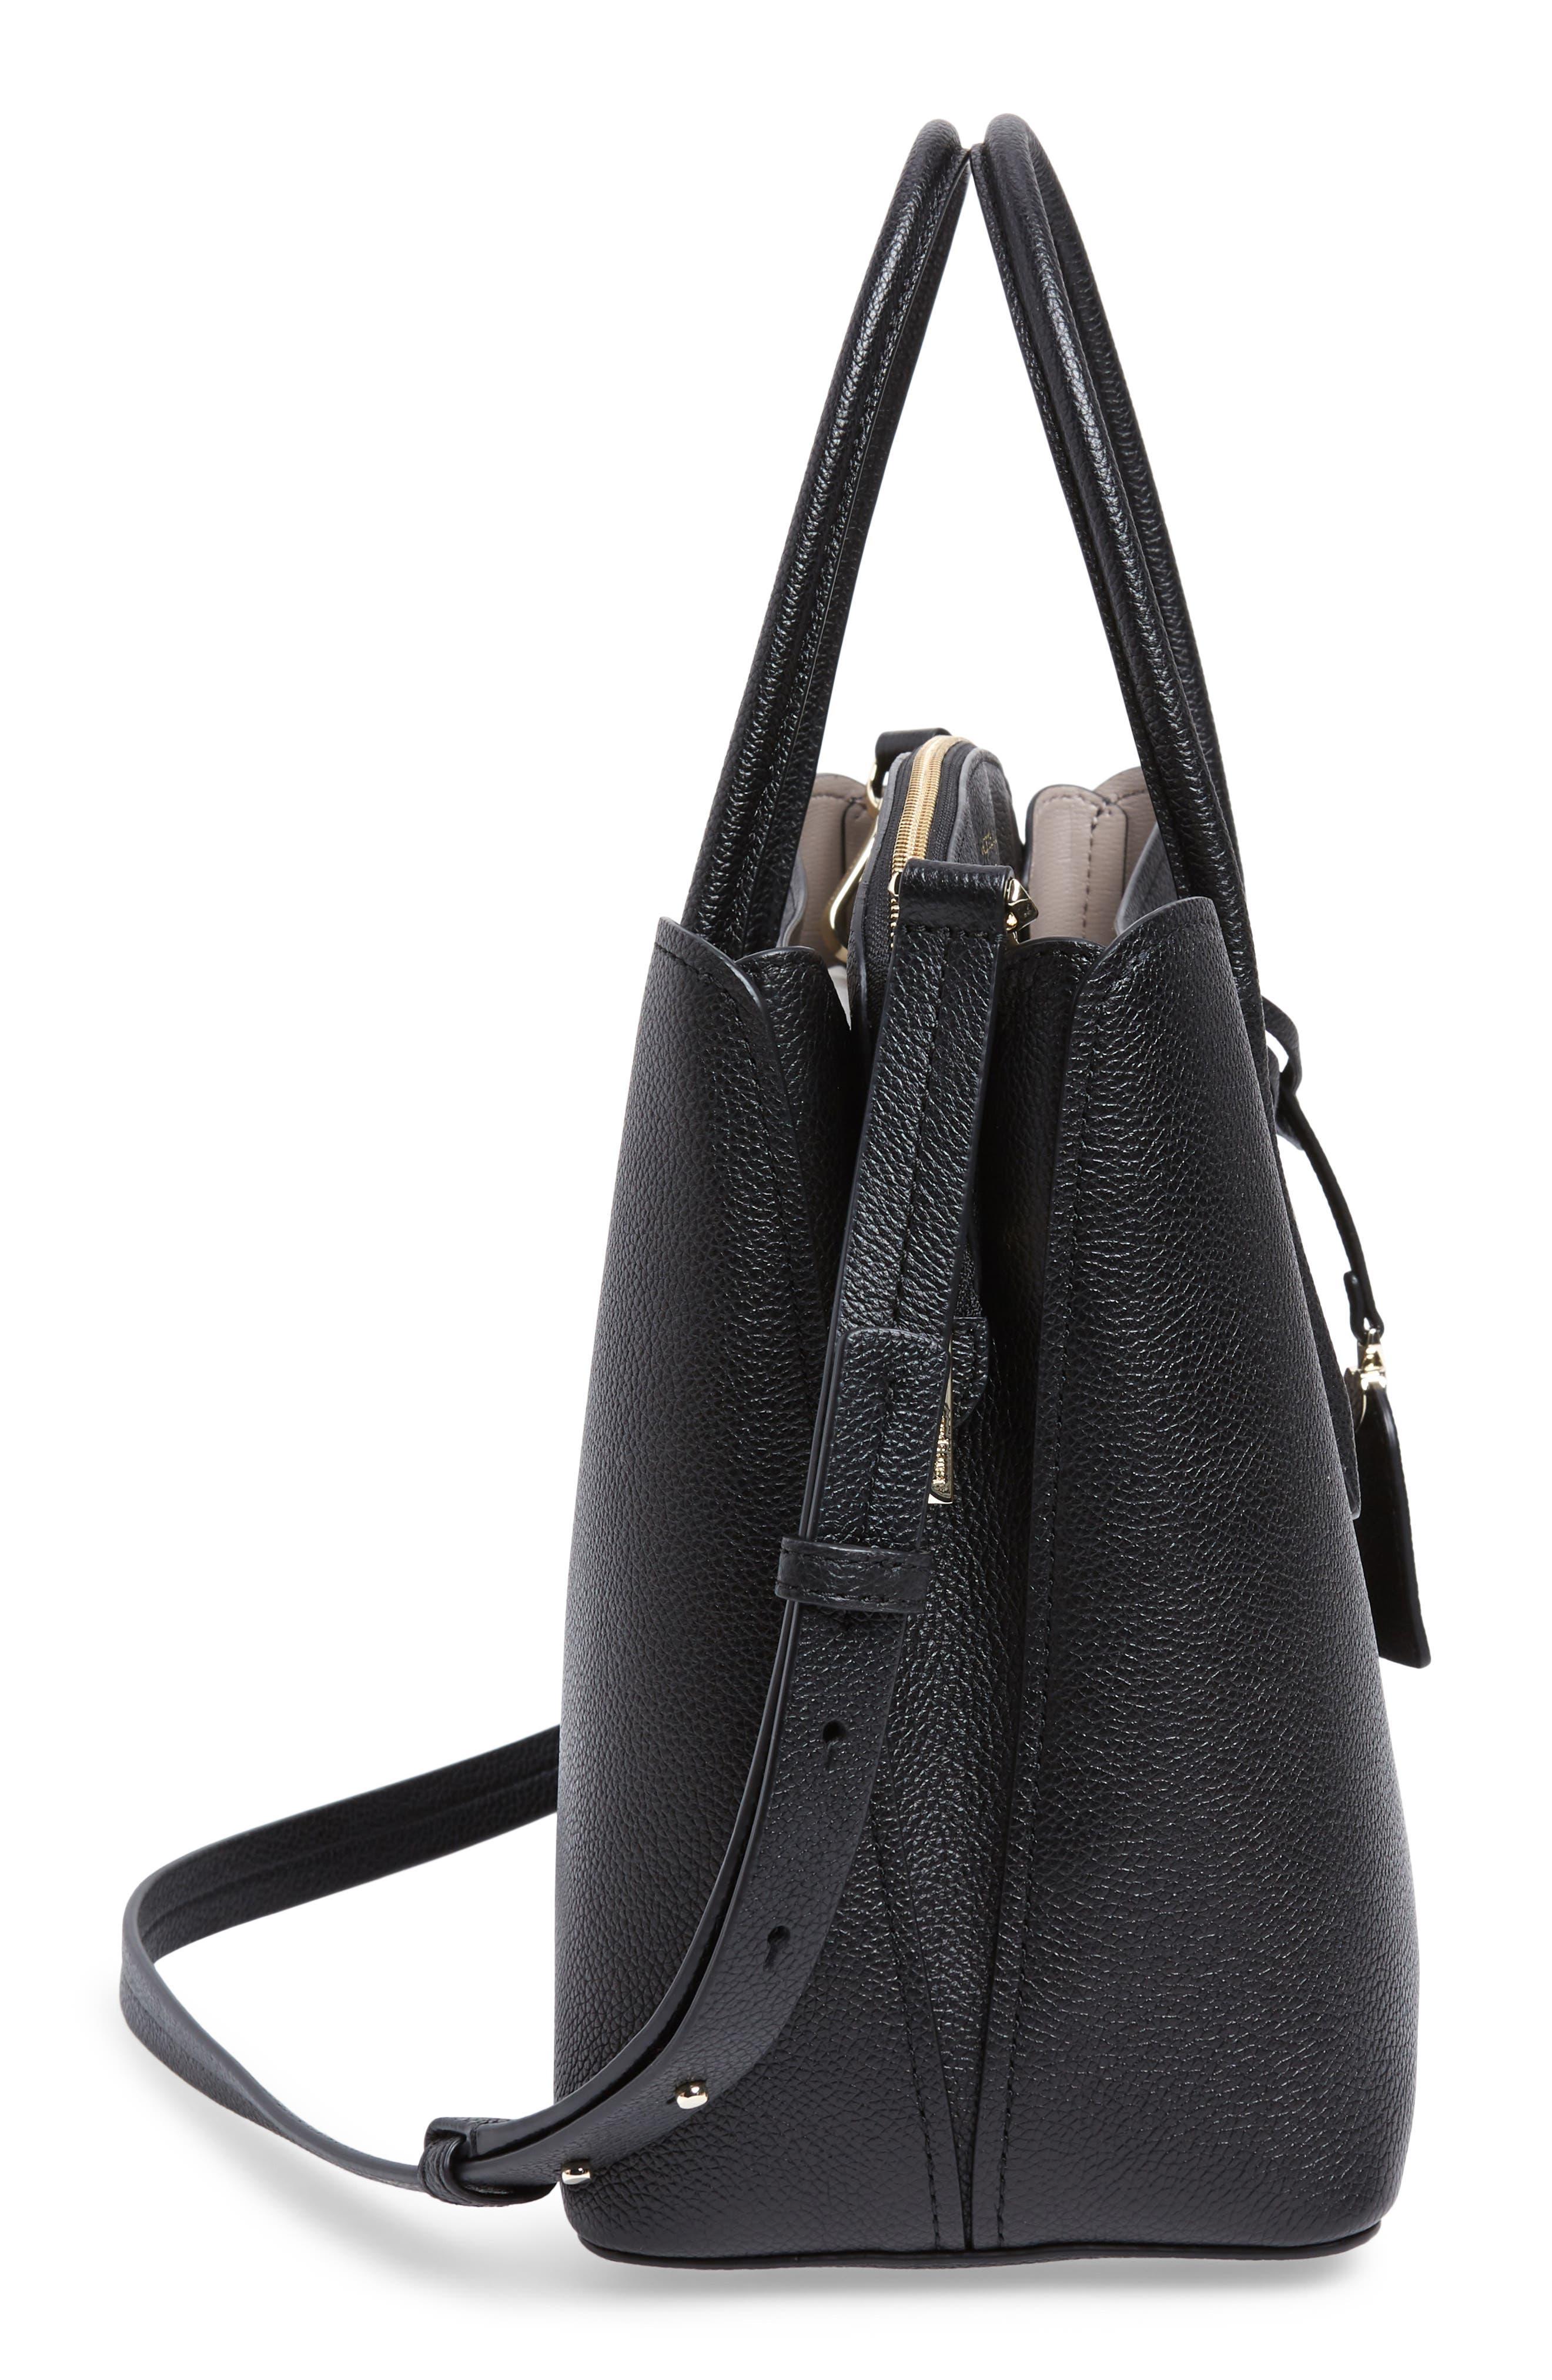 KATE SPADE NEW YORK,                             large margaux leather satchel,                             Alternate thumbnail 5, color,                             BLACK